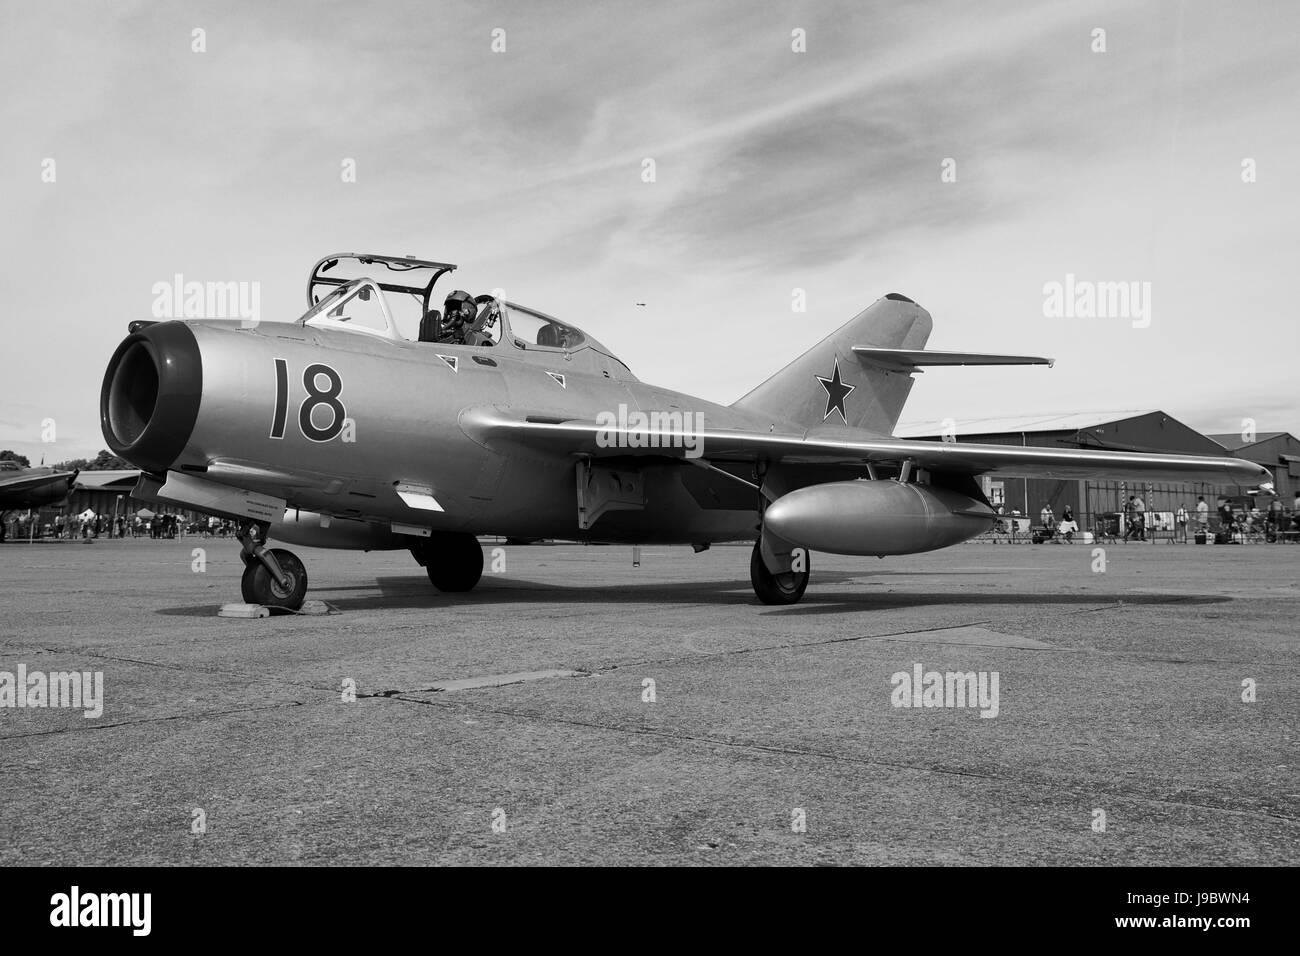 Mikoyan-Gurevich MiG-15UTI - Stock Image